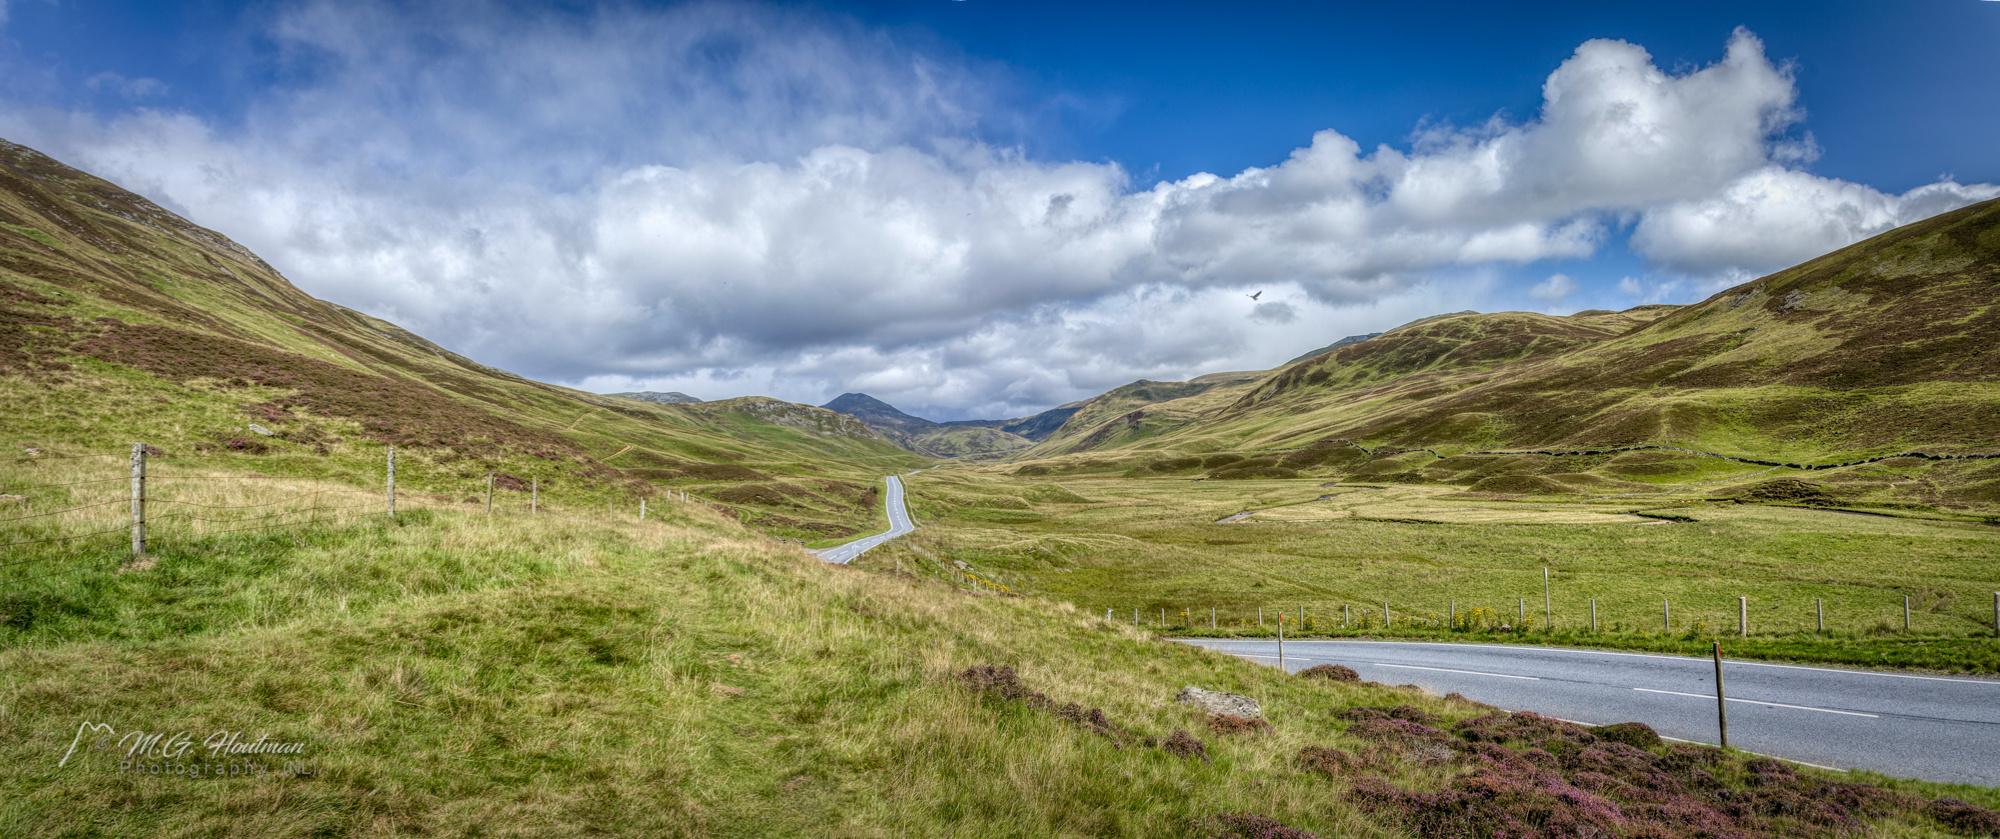 The Highlands - Scotland